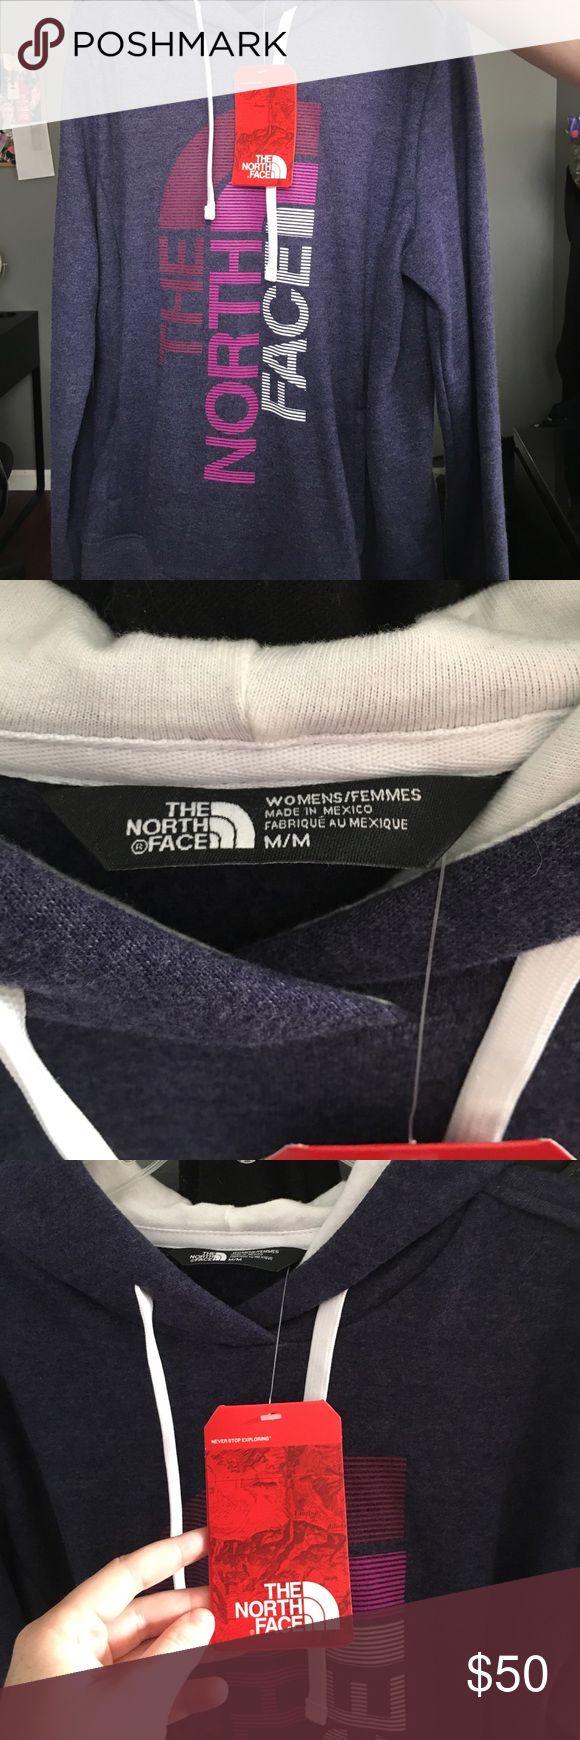 NWT, never worn, Women's north face hoodie NWT Women's purple north face hoodie, size medium The North Face Tops Sweatshirts & Hoodies